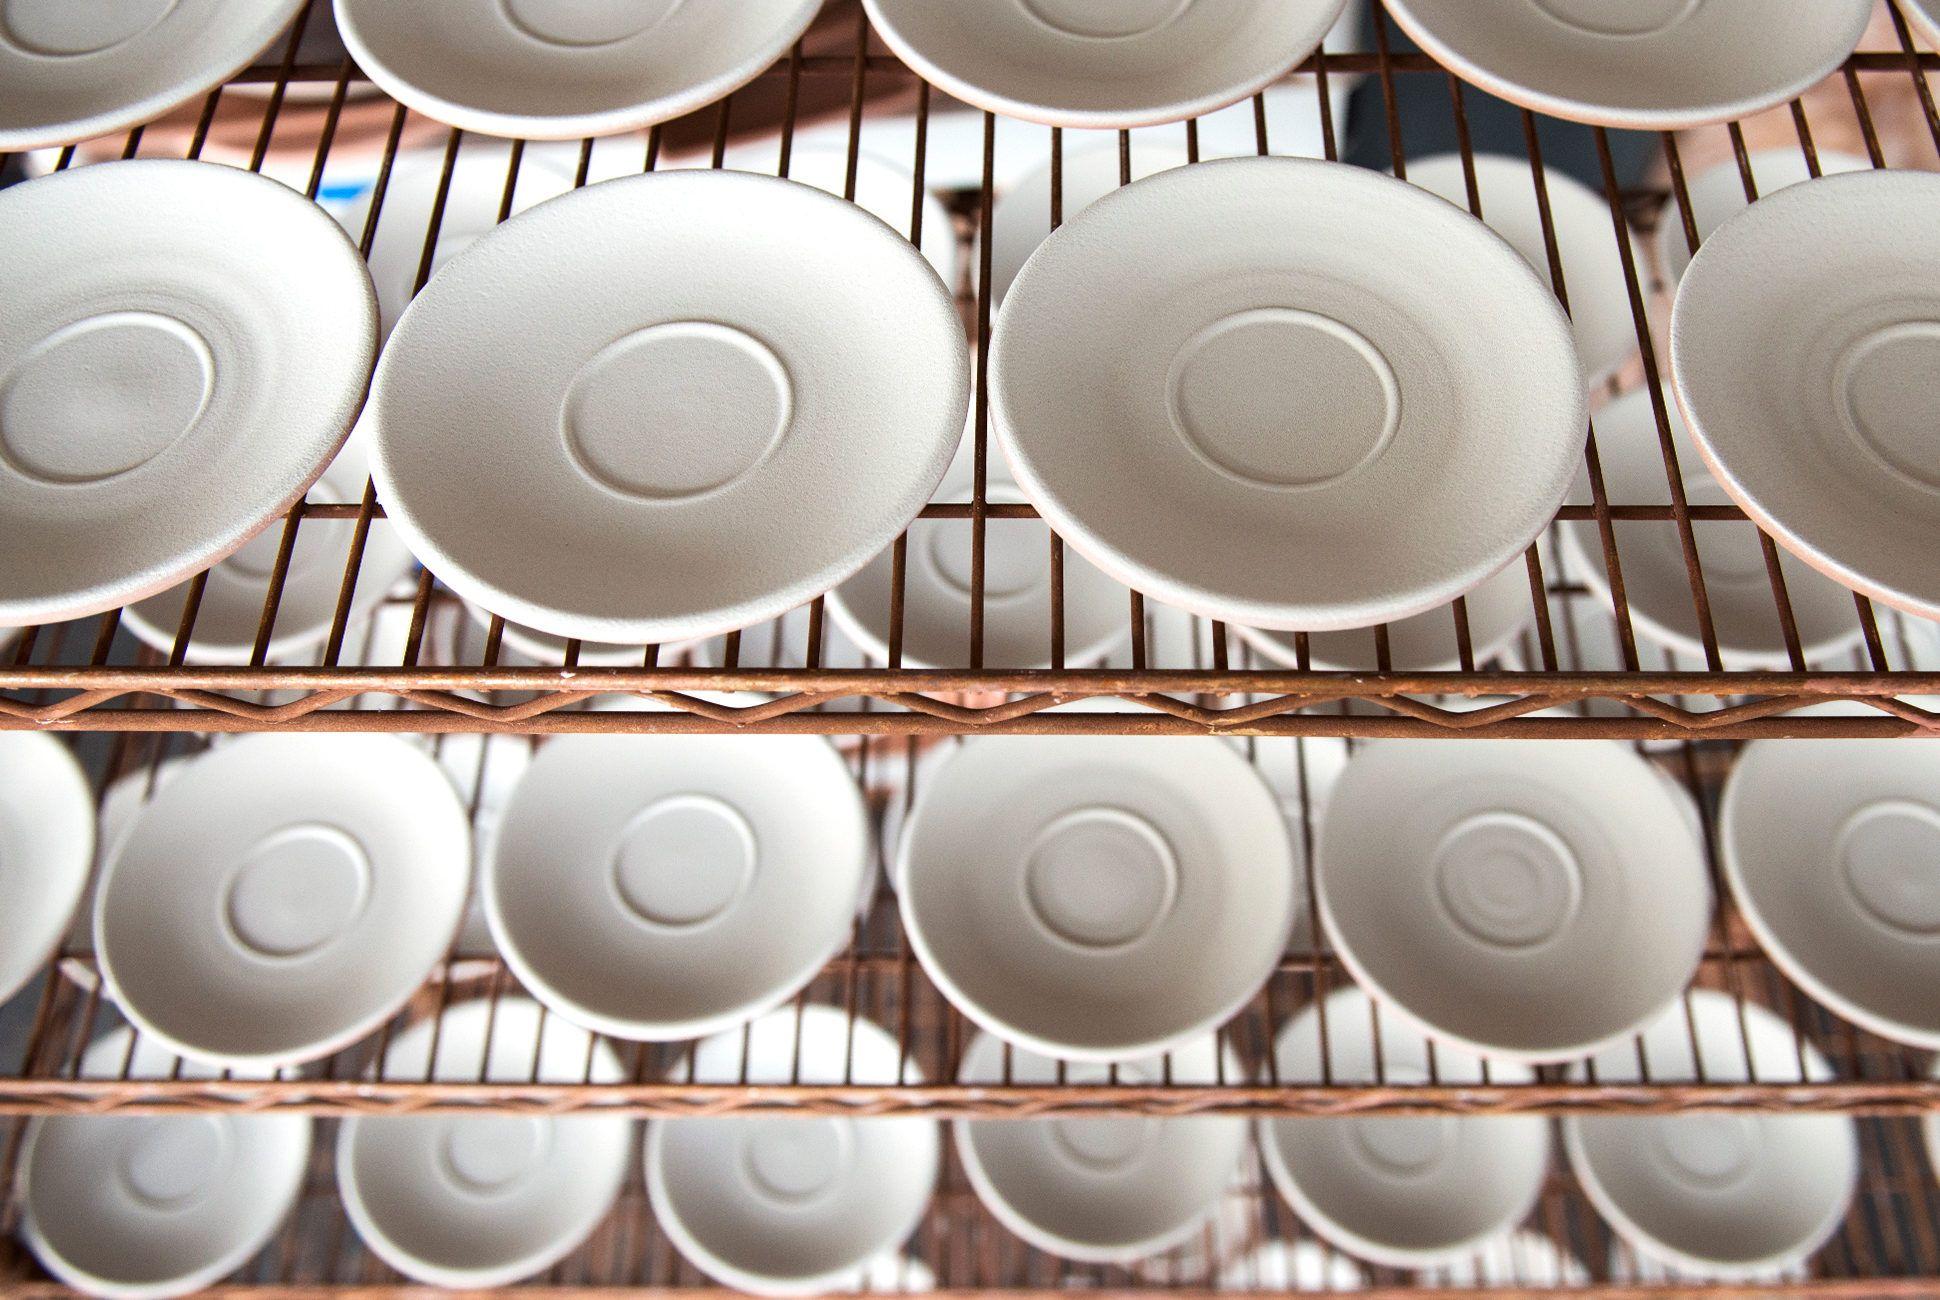 Jono-Pandolfi-pottery-gear-patrol-970-retina-new